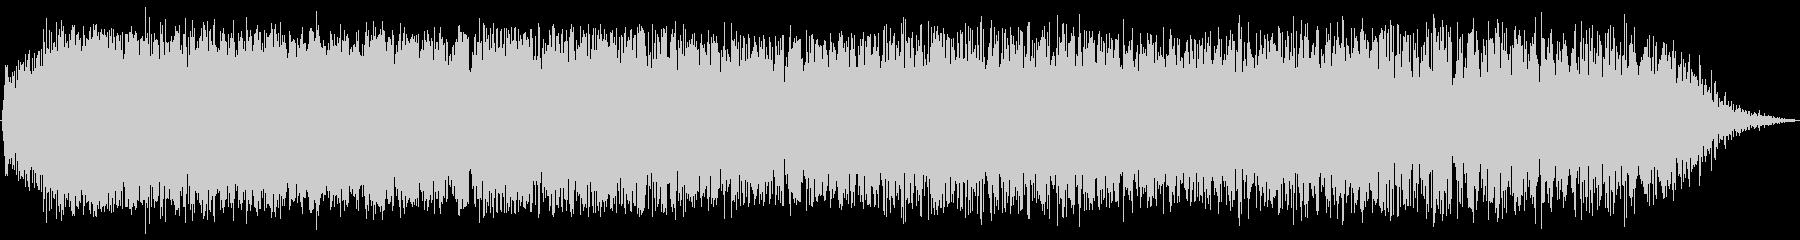 SynthSweep EC03_36_4の未再生の波形